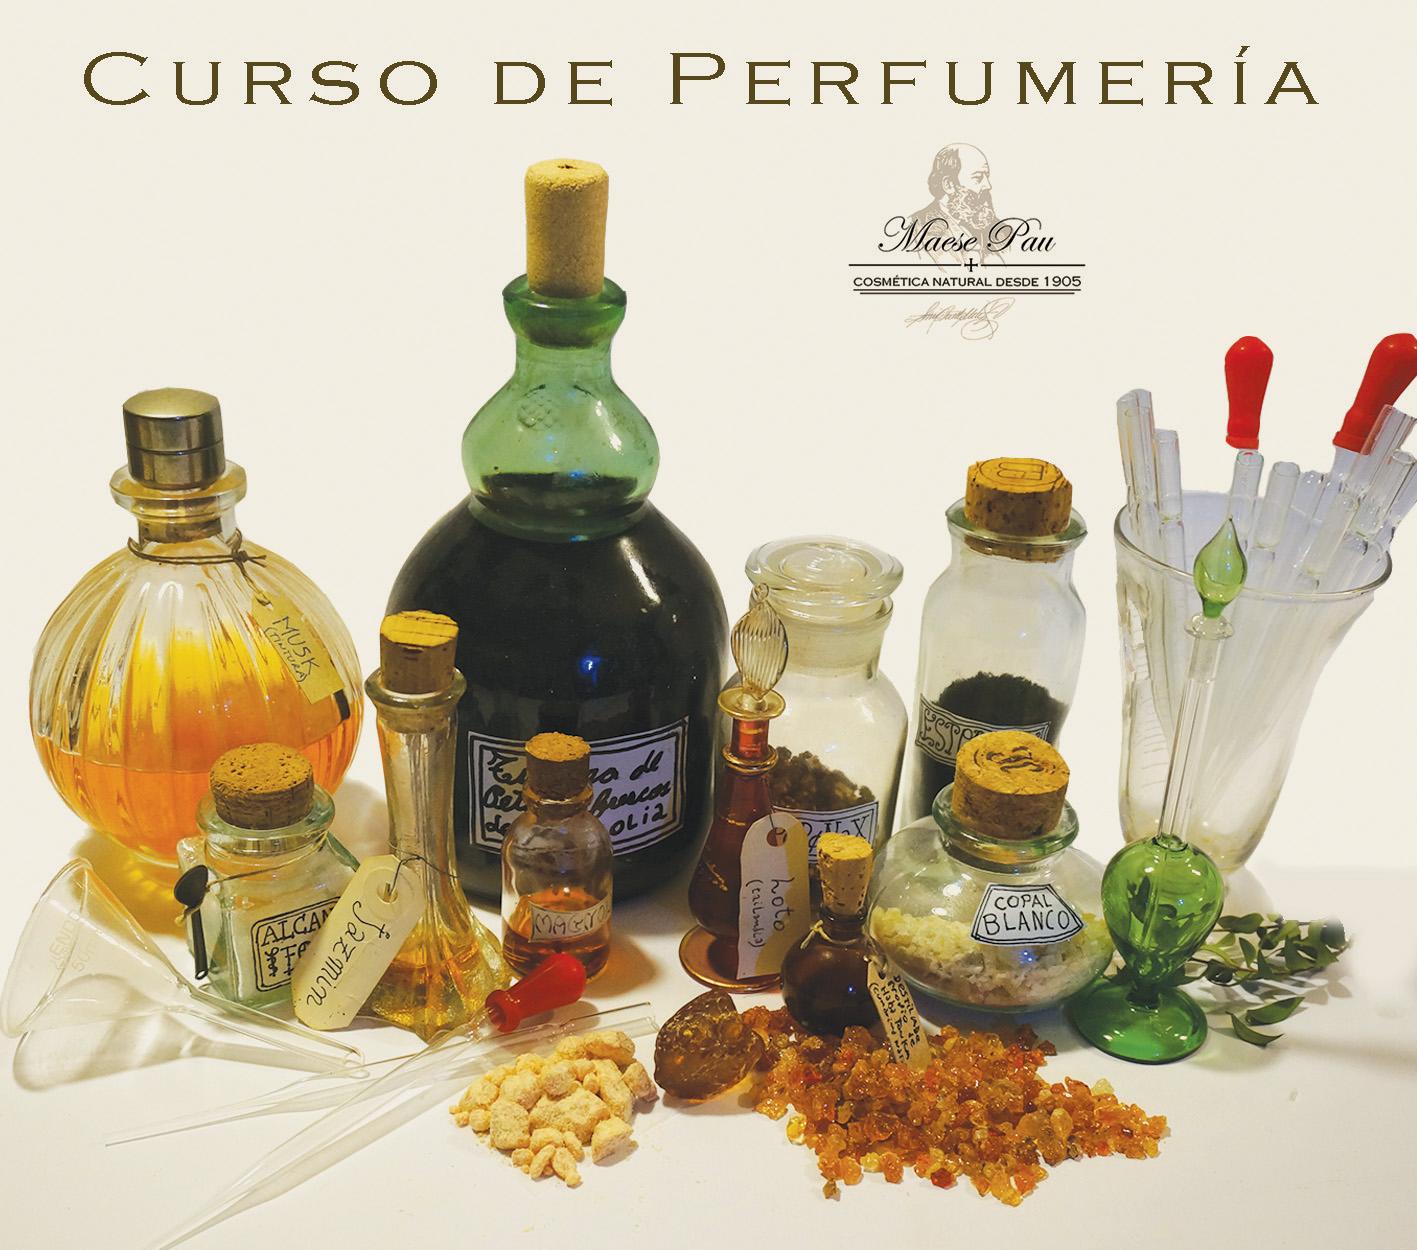 Curso de Perfumería